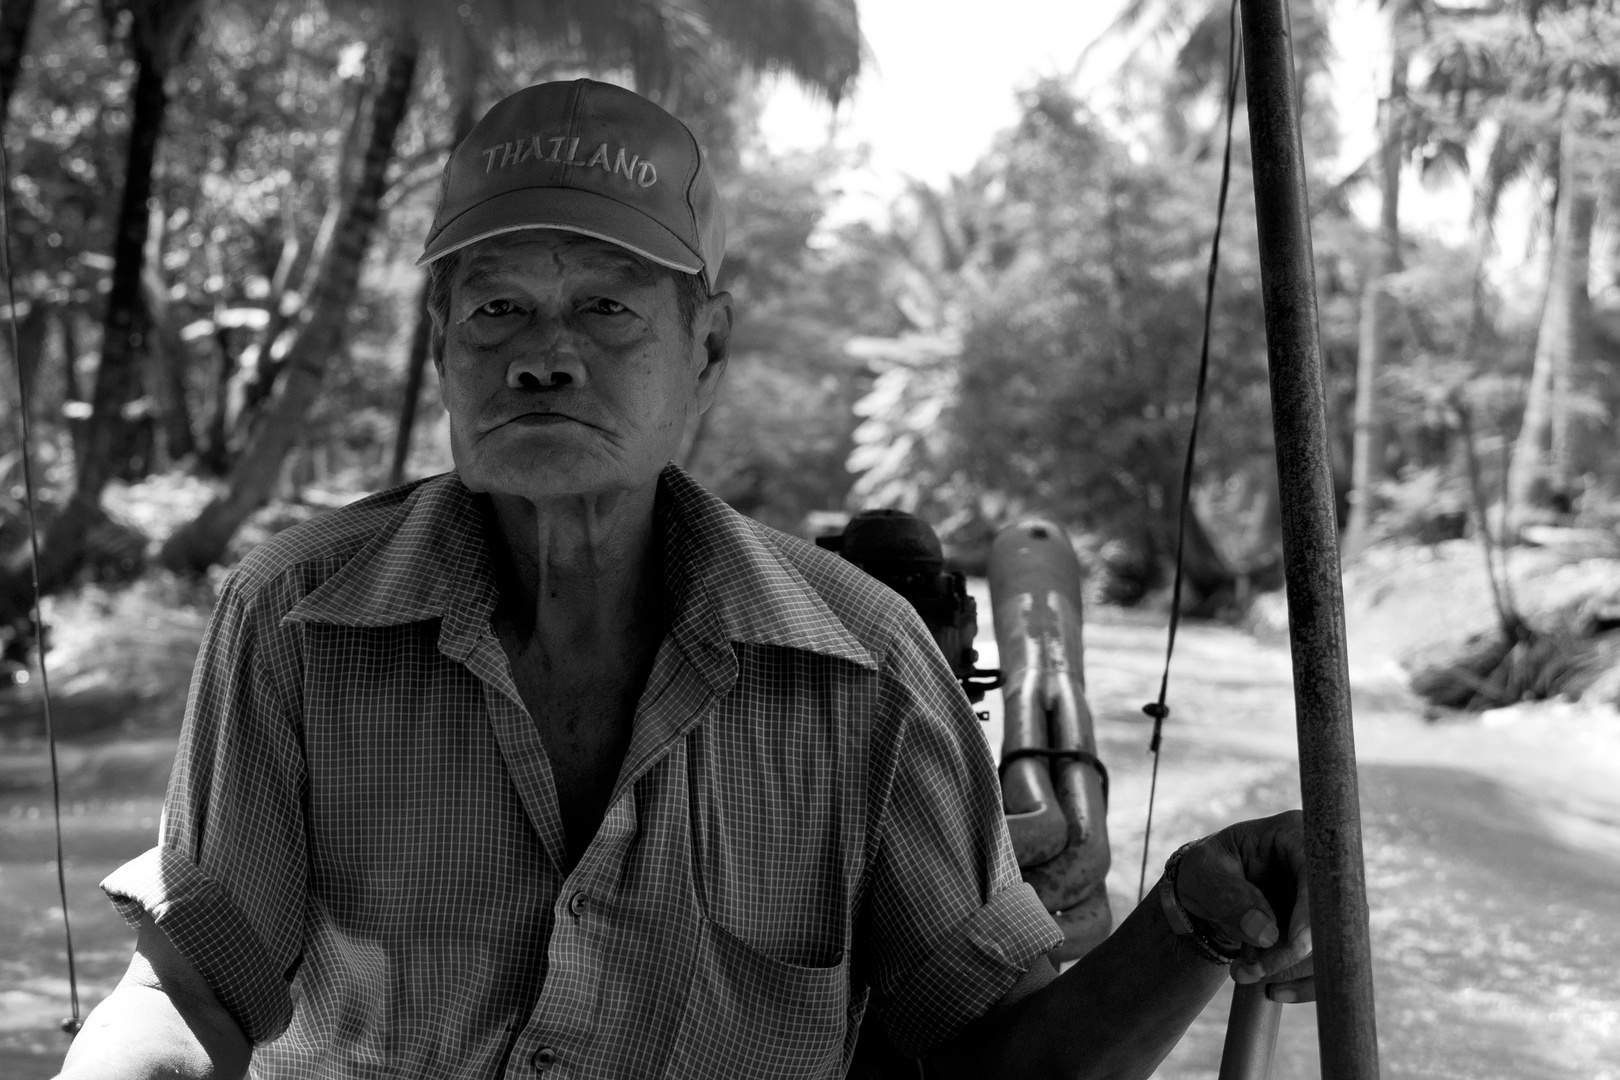 Old Thai in Amphawa